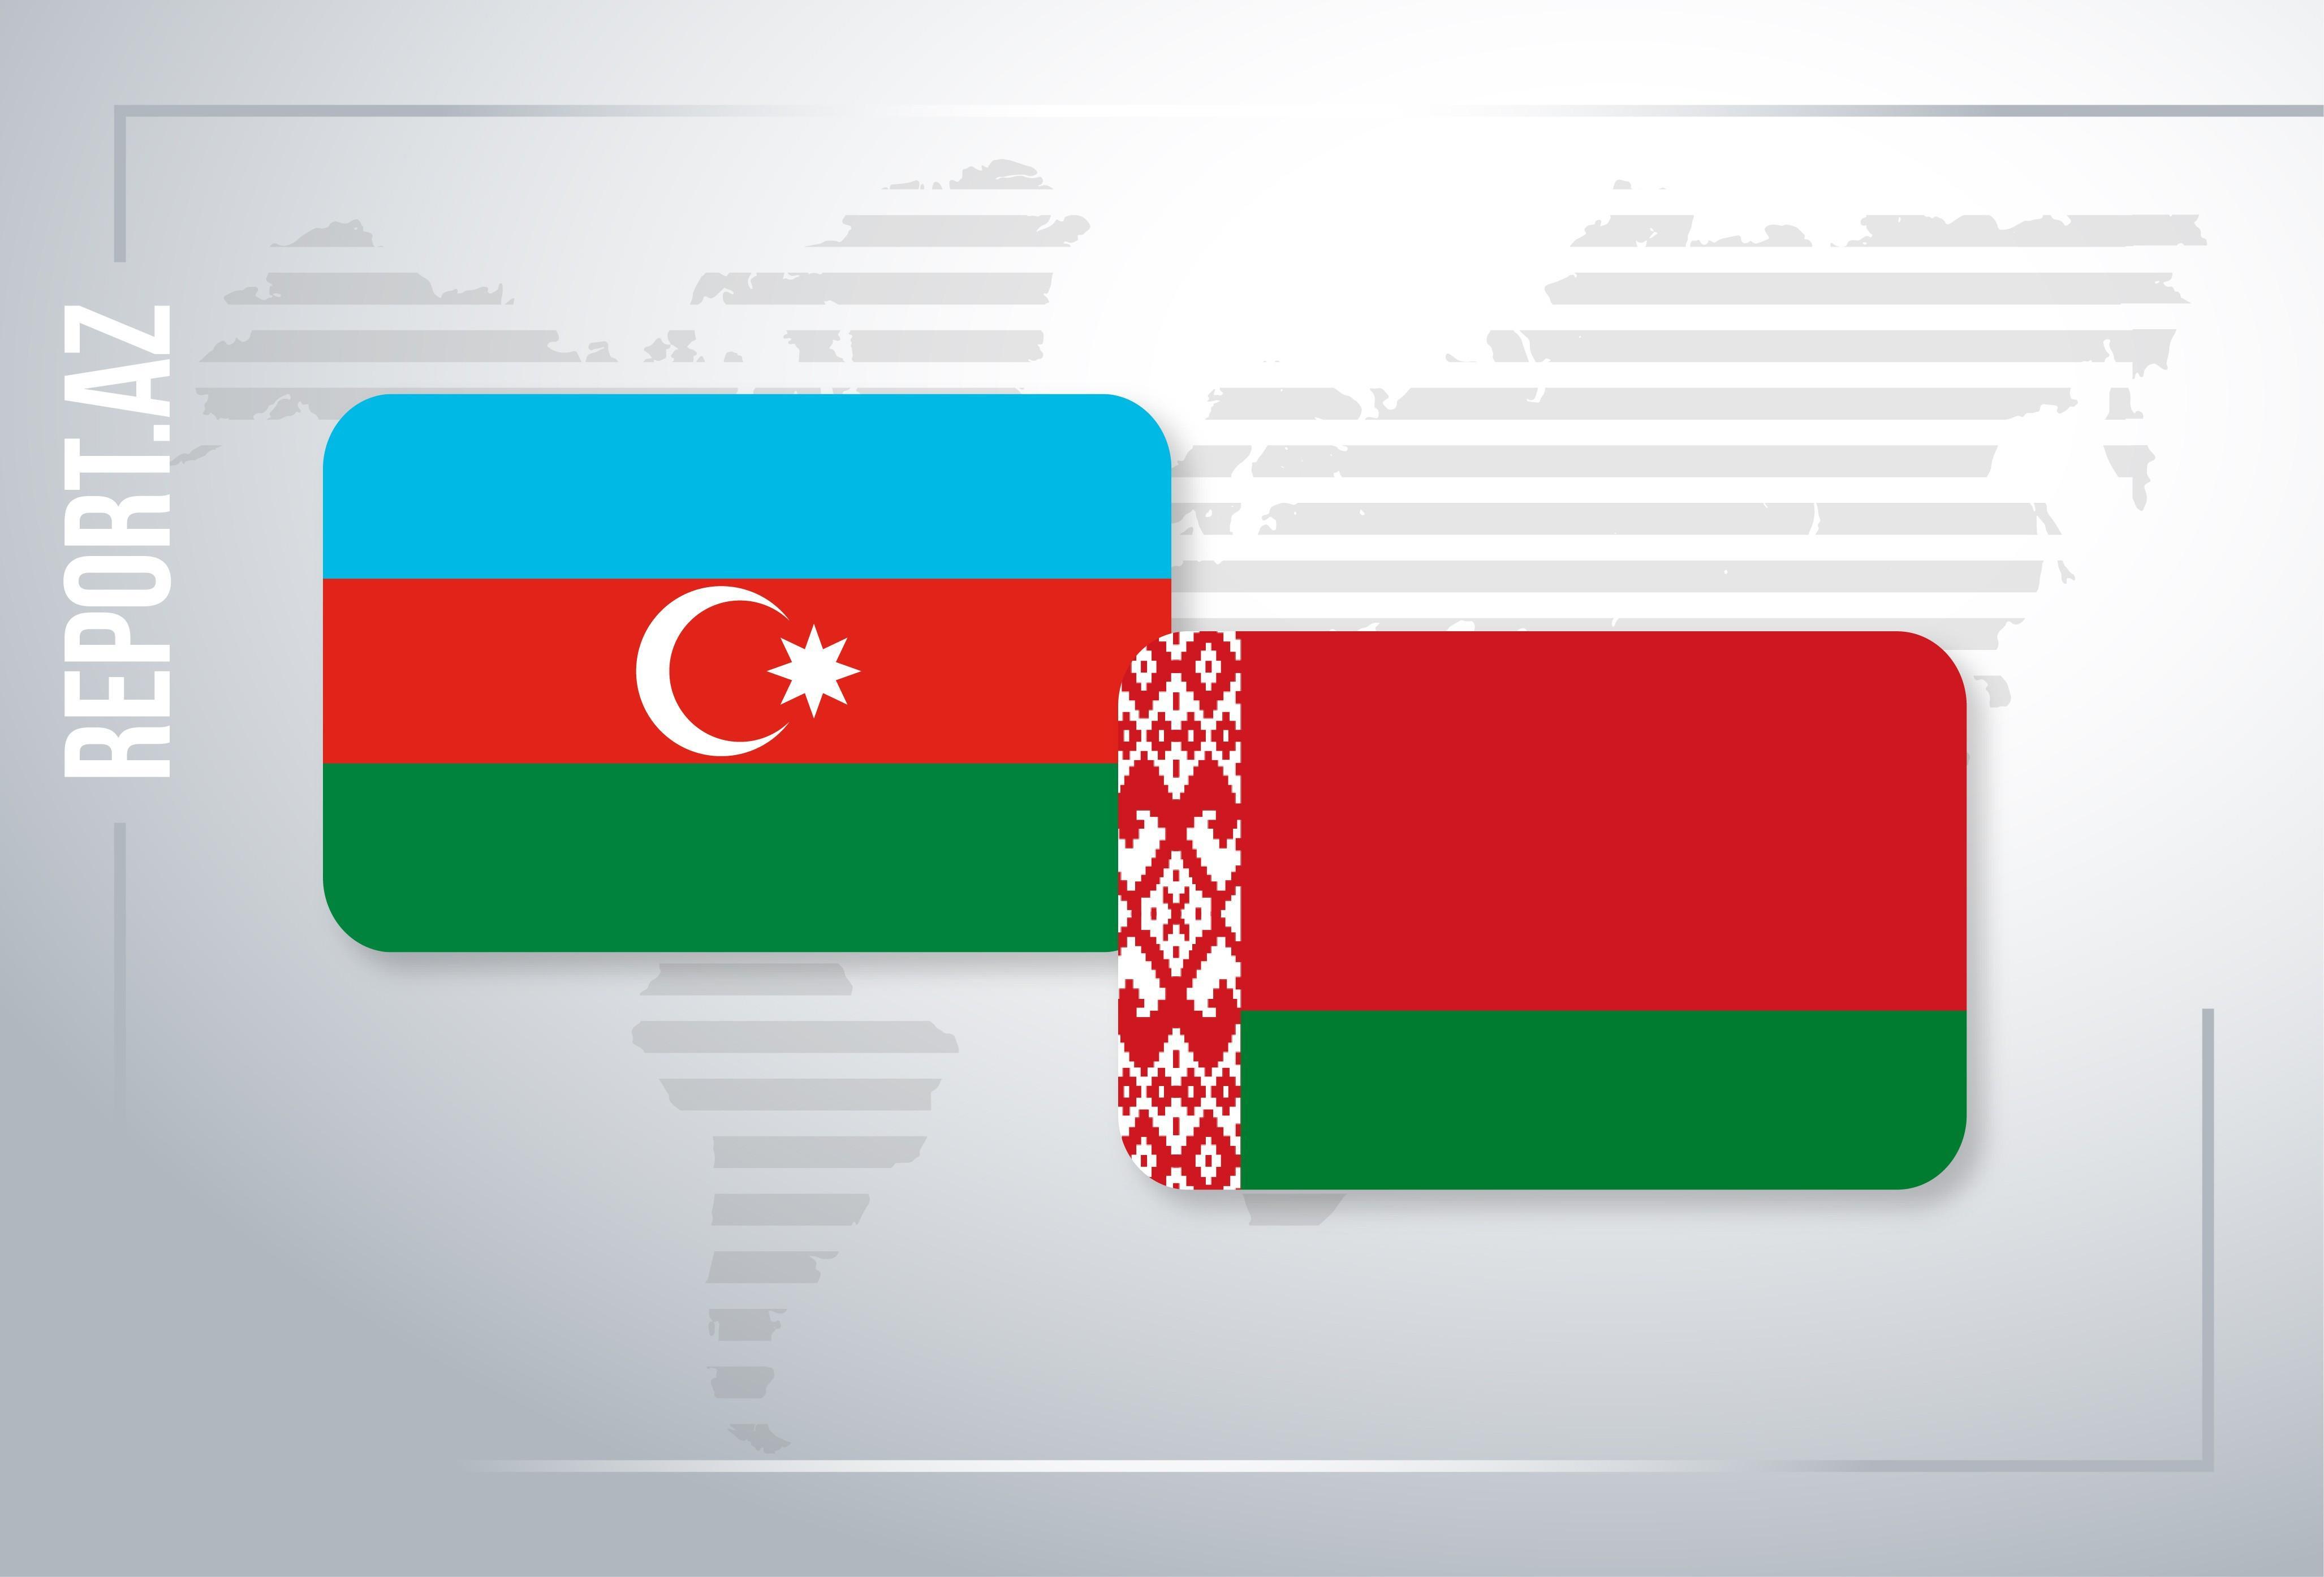 Директор центра: Беларусь благодарна Азербайджану за помощь в борьбе с COVID-19